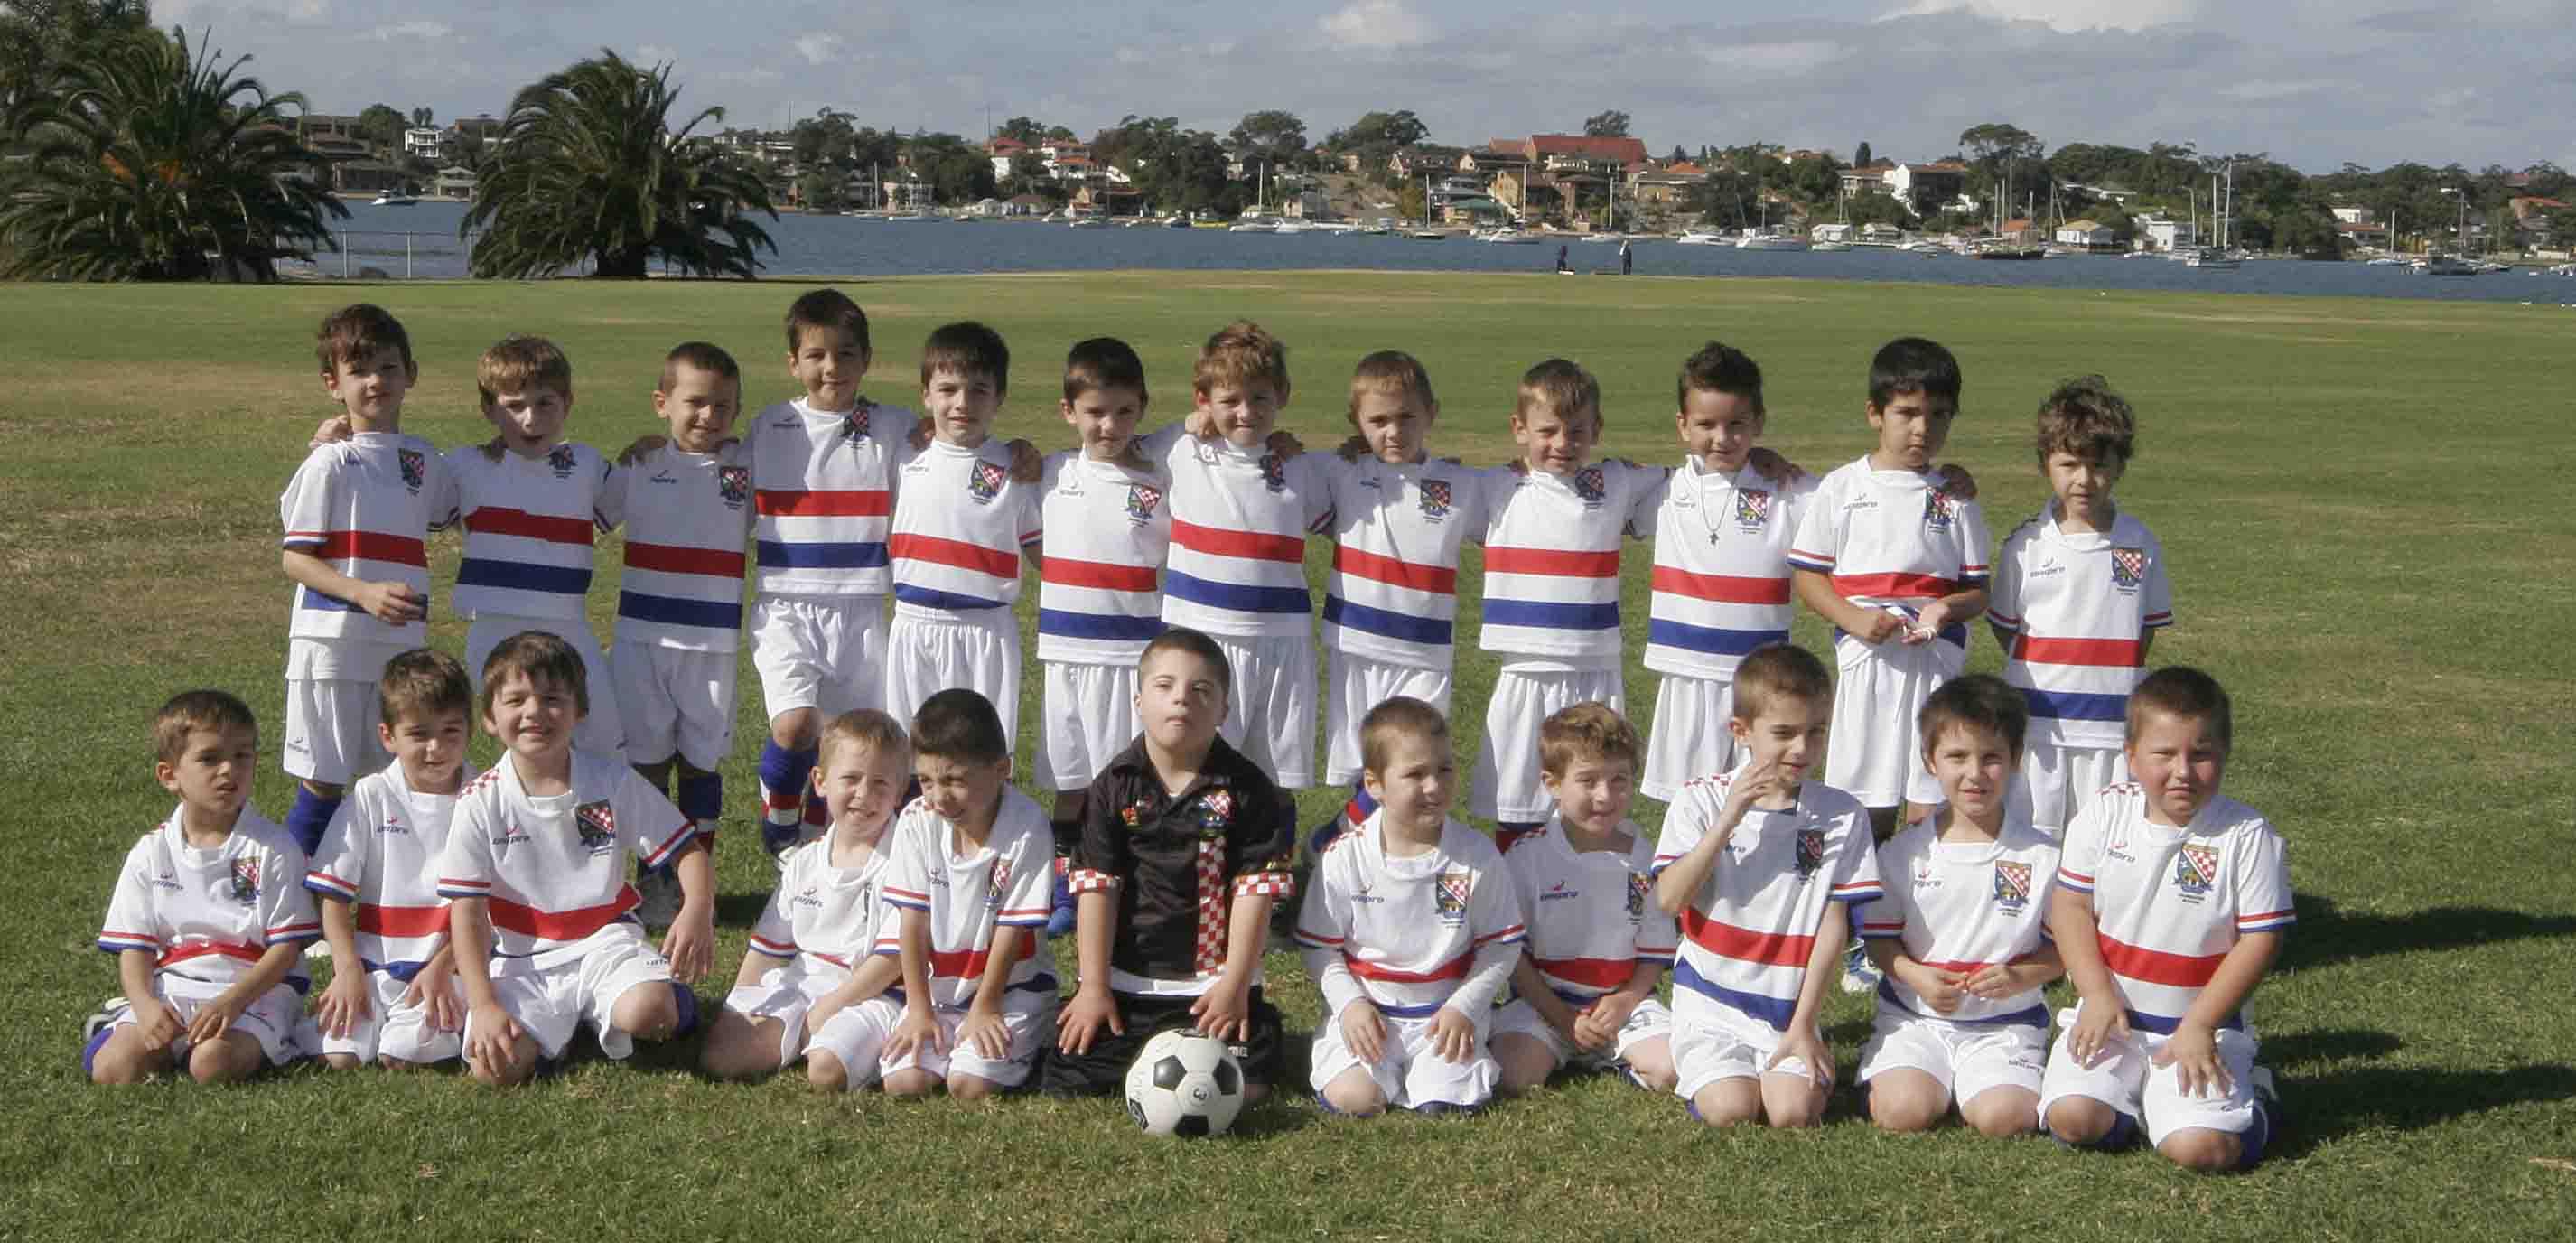 HZFC Under 6's 2010